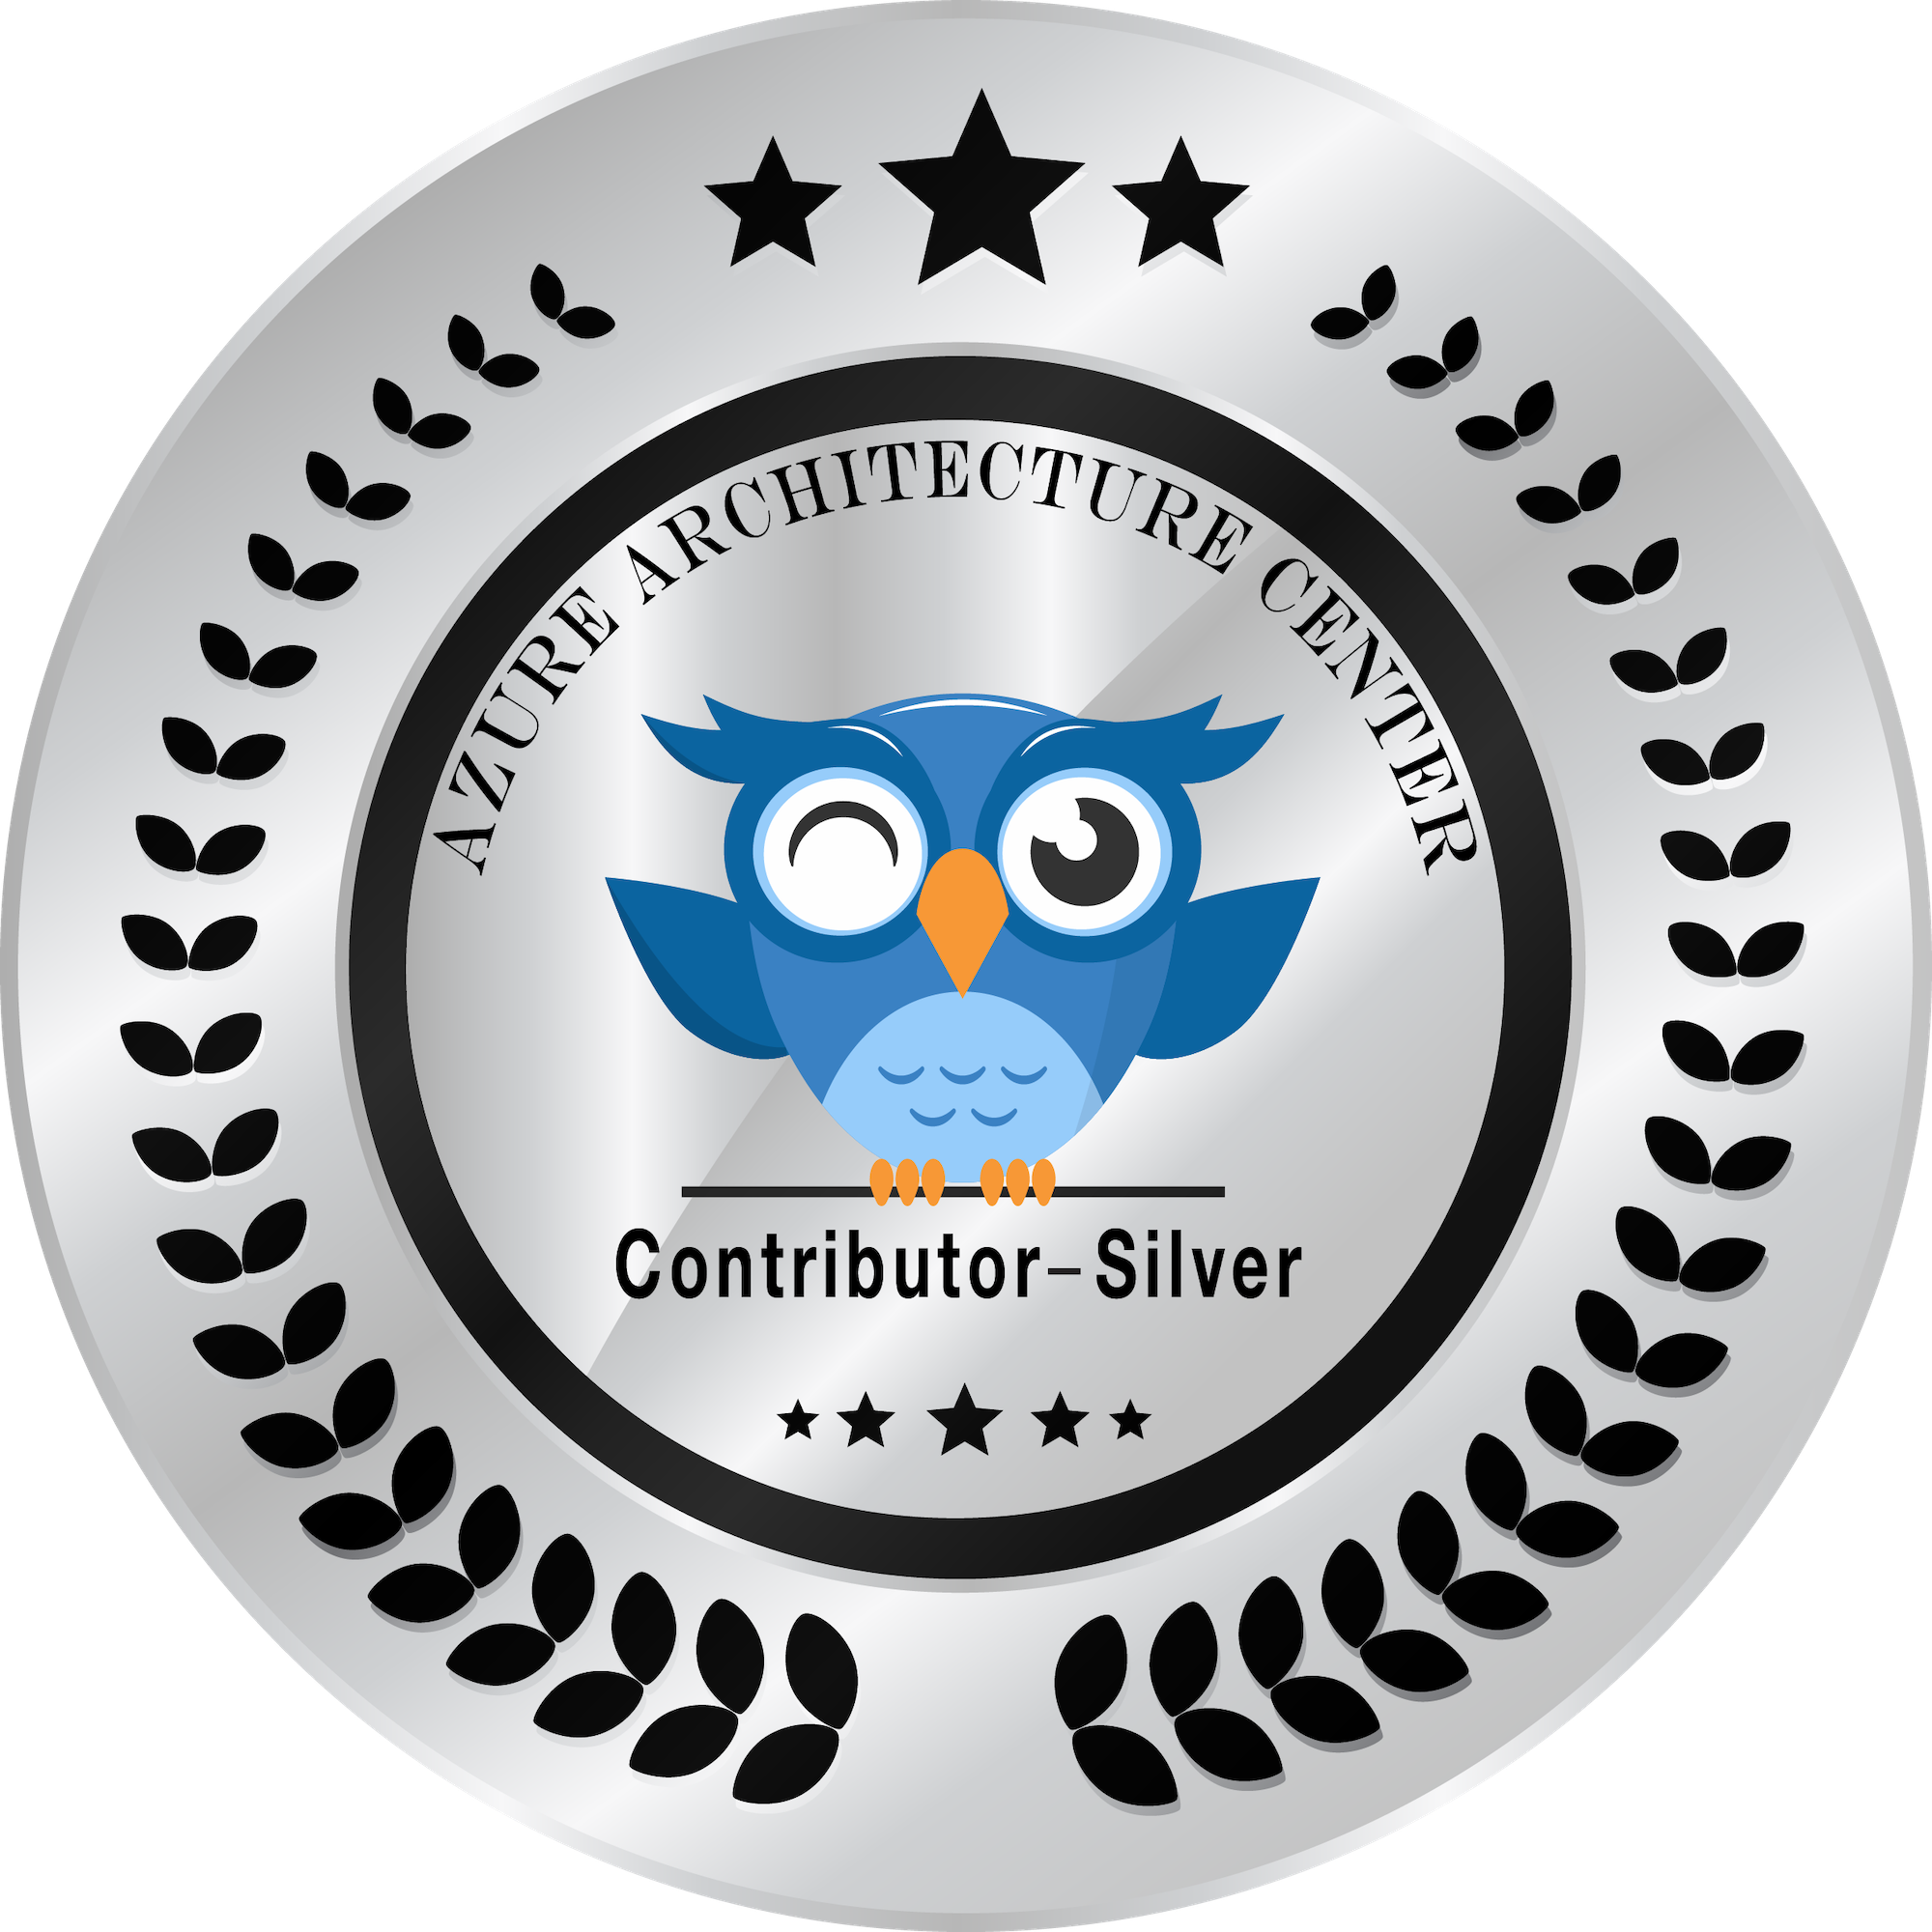 Azure Architecture Center Contributor - Silver FY21